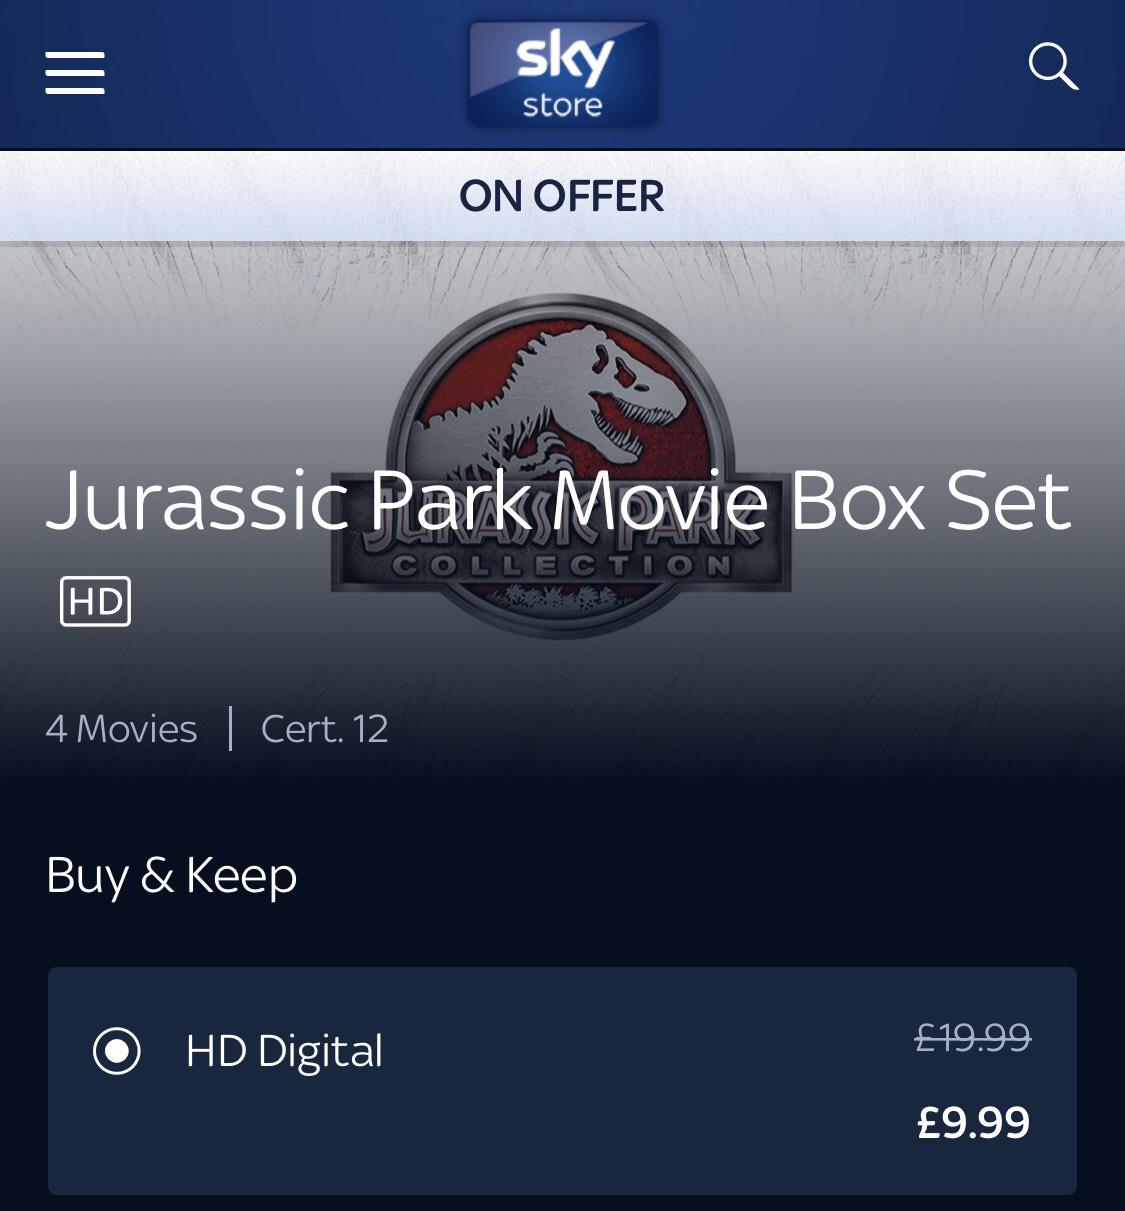 Jurassic Park 1-4, Just £9.99 @ Sky Store